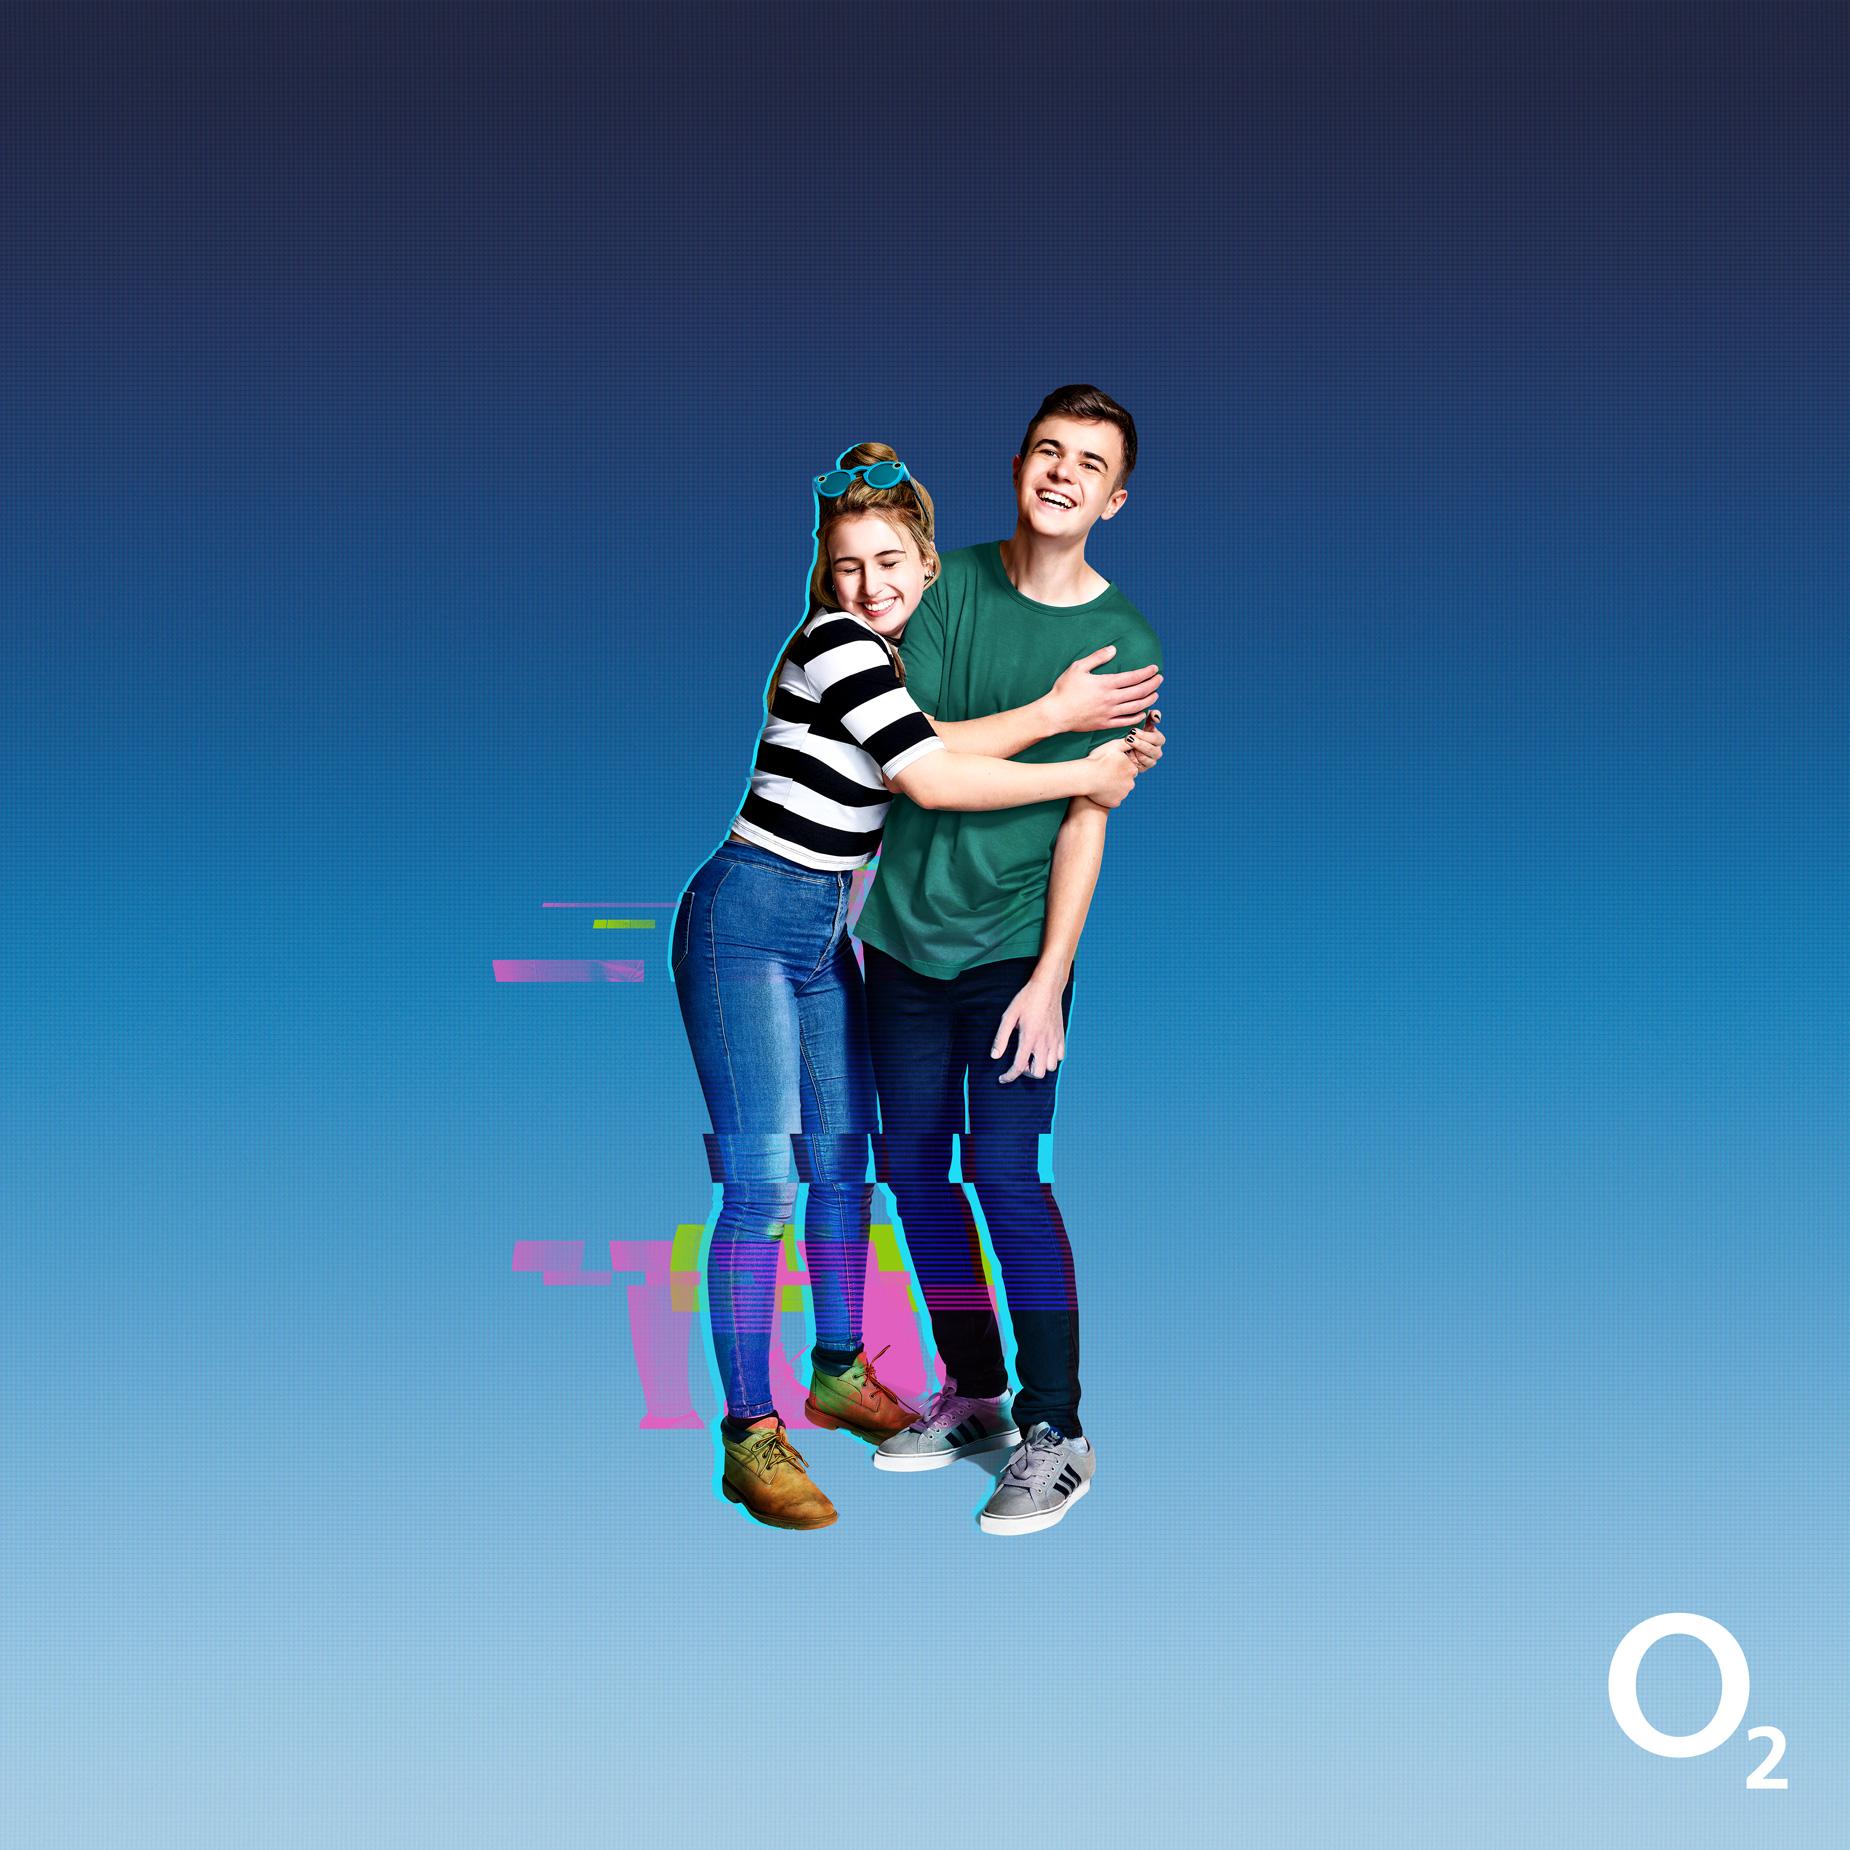 O2-Go-Think-Big-Chloe-&-Lewis-Hine-1-Small-RGB